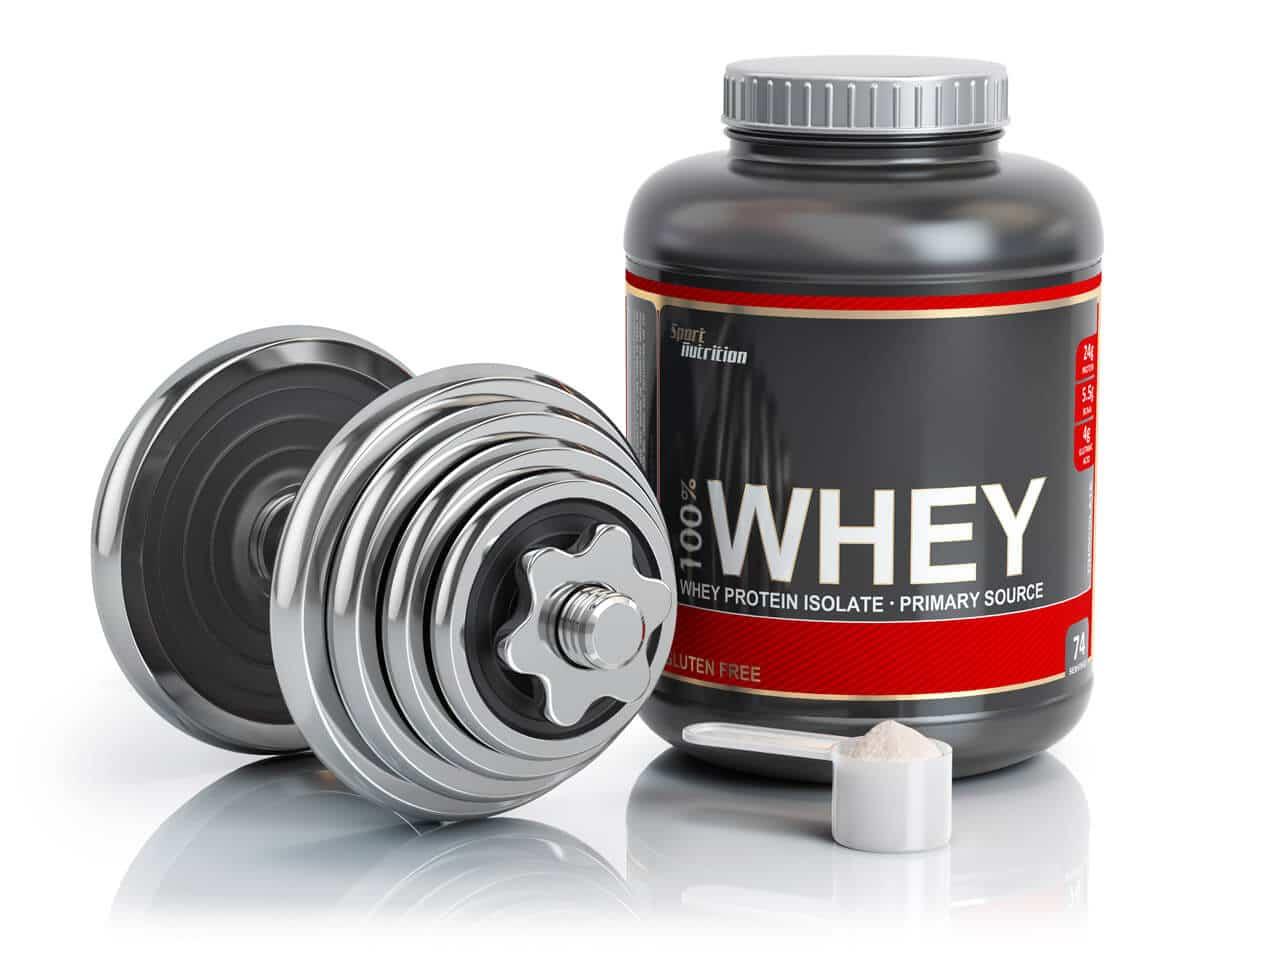 Whey Protein Xylitol